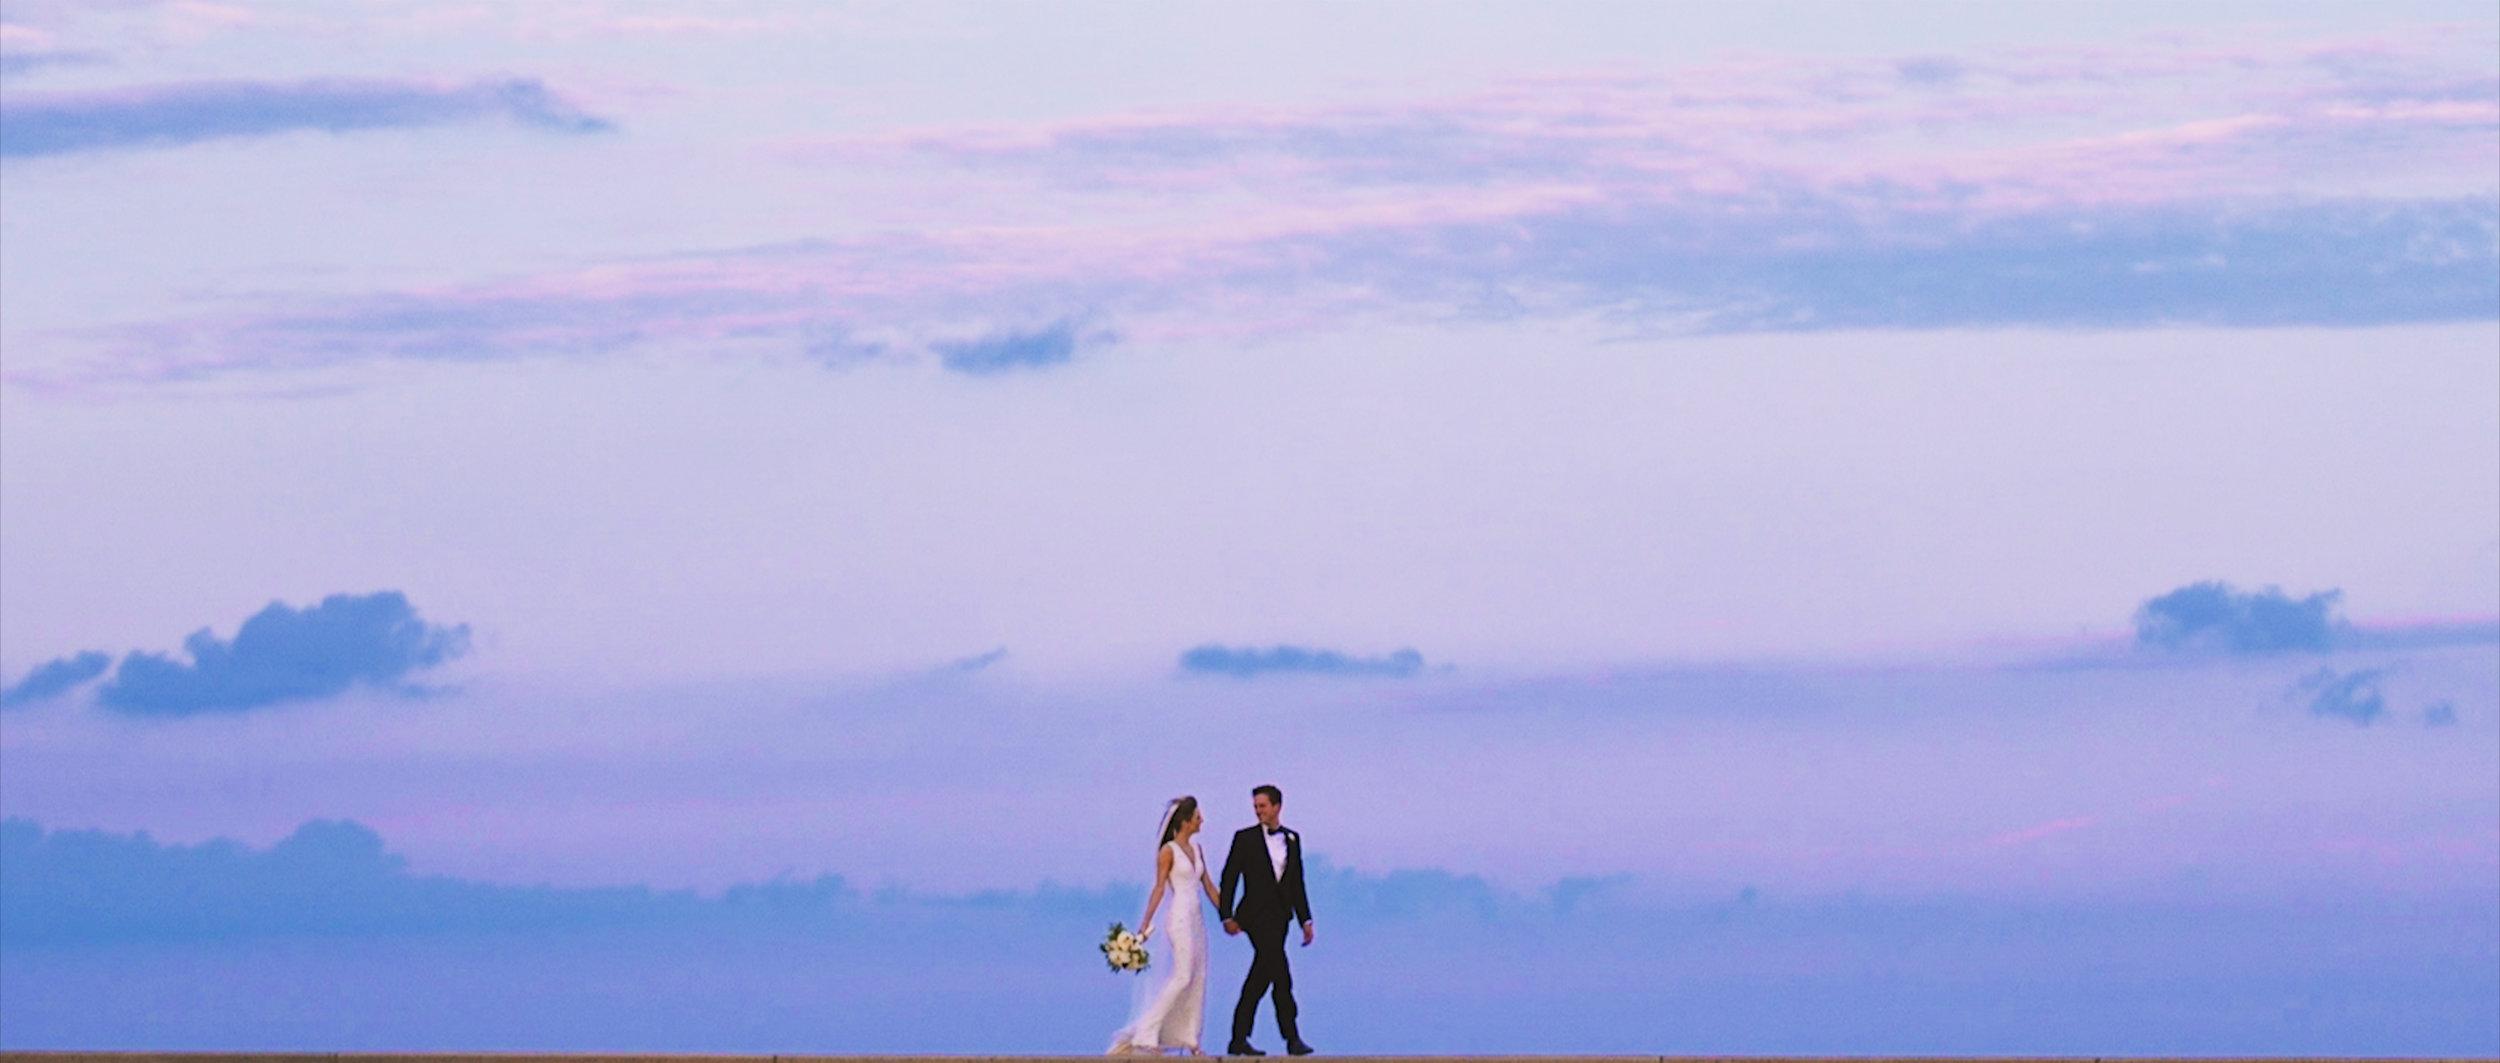 Bride and groom at Lake Michigan |Chicago Wedding Videographers